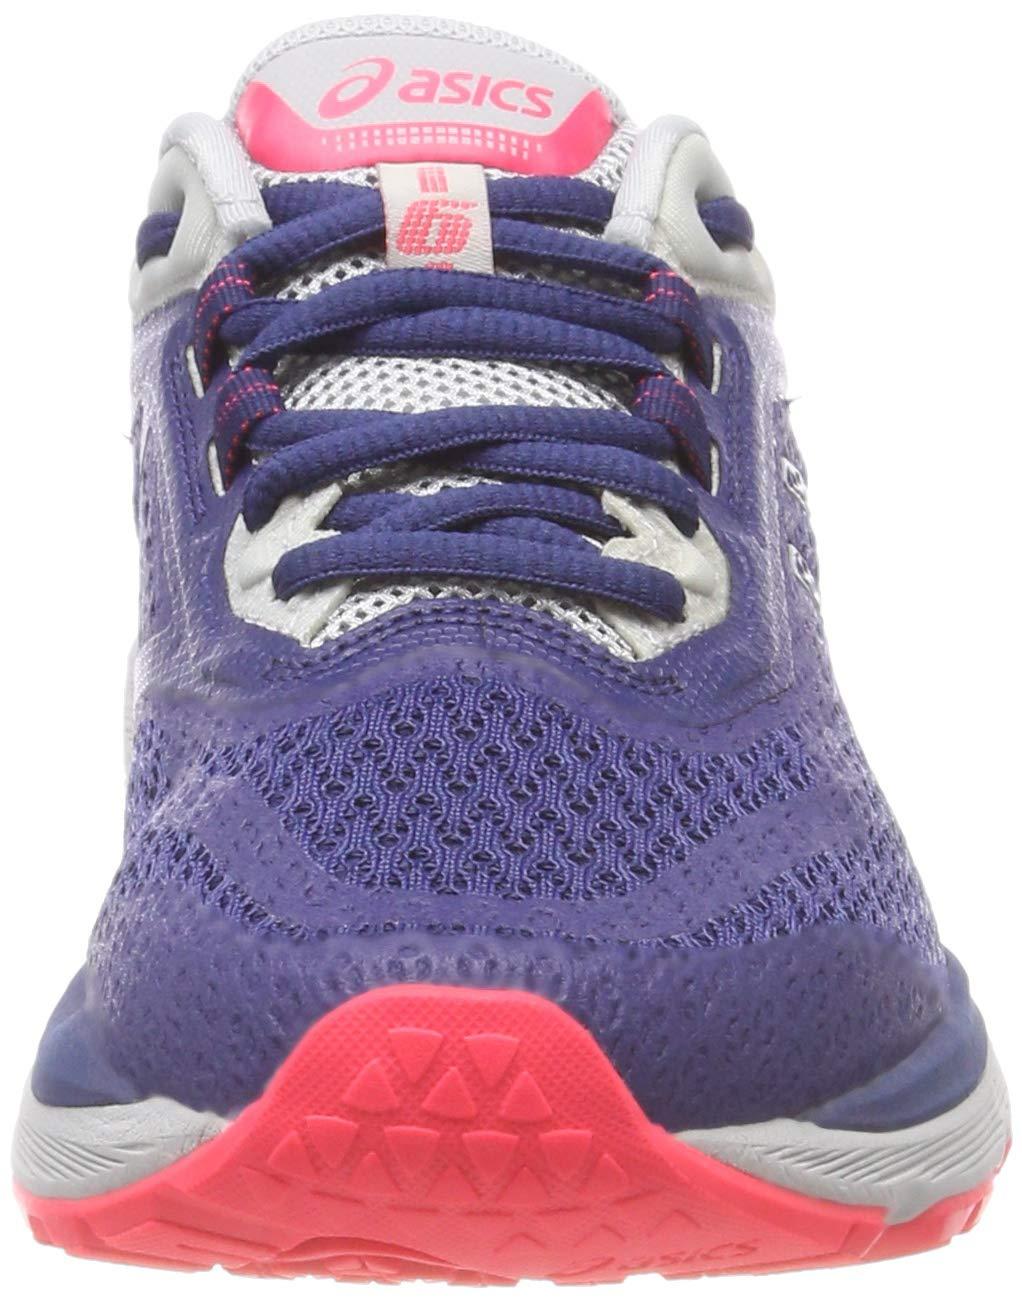 716NwpMnCQL - ASICS Women's Gt-2000 6 Trail Plasmaguard Running Shoes, 11.5 UK